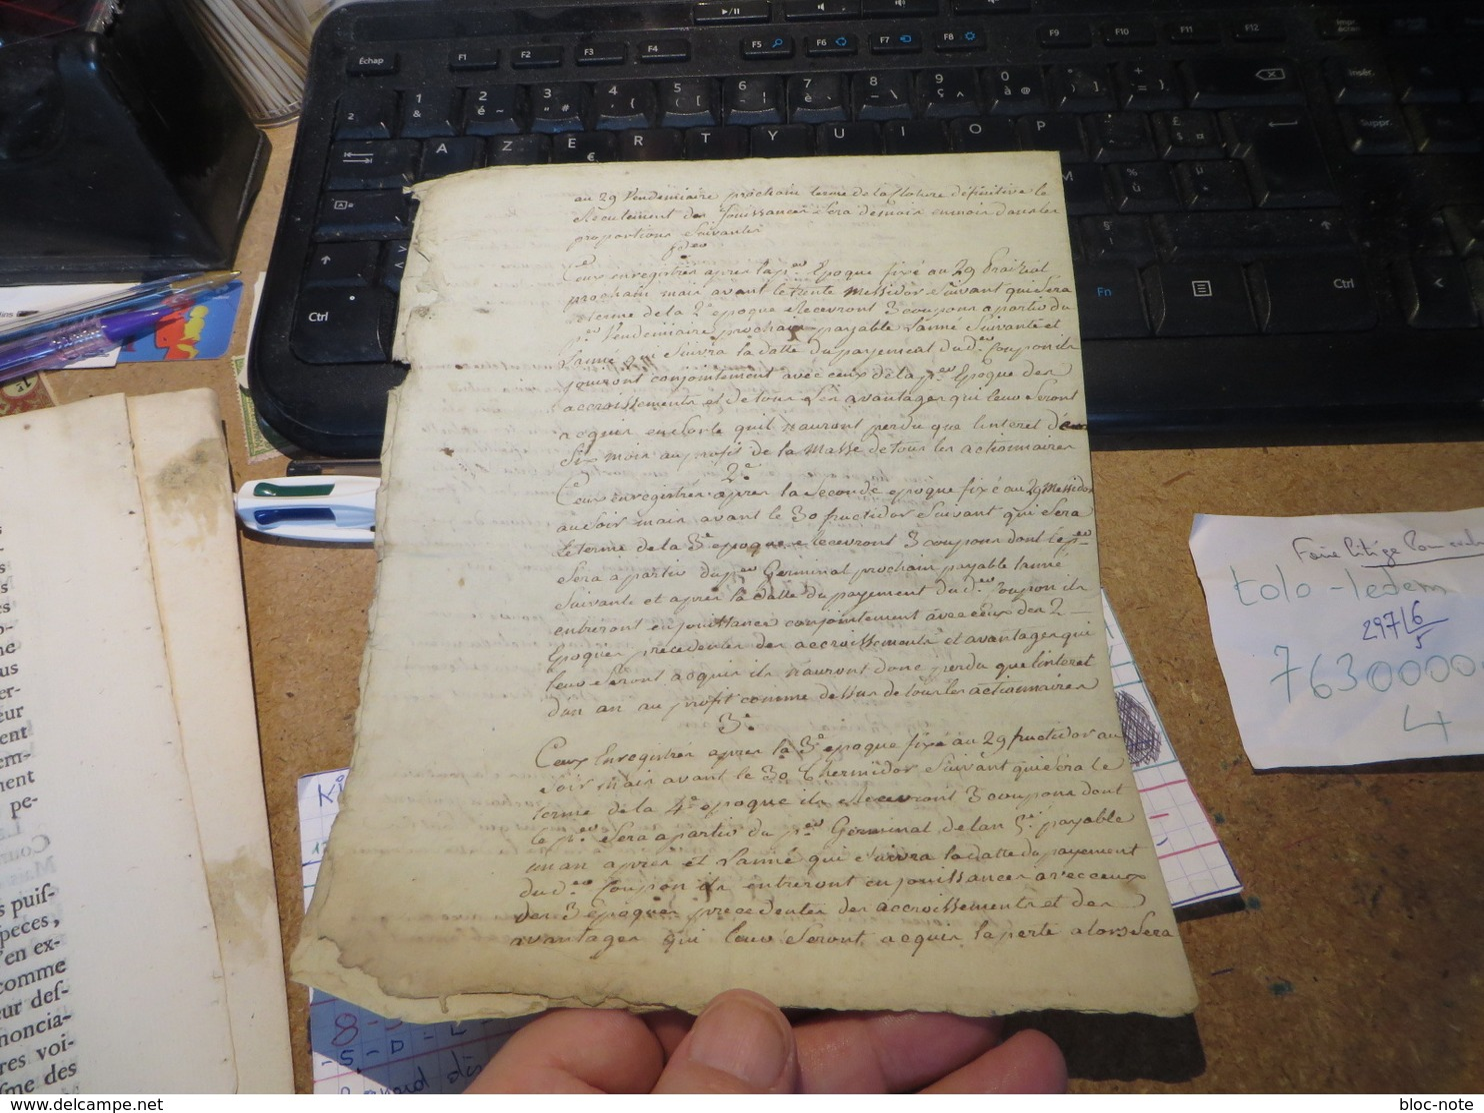 Dire Un Million D'habitann - Documentos Históricos